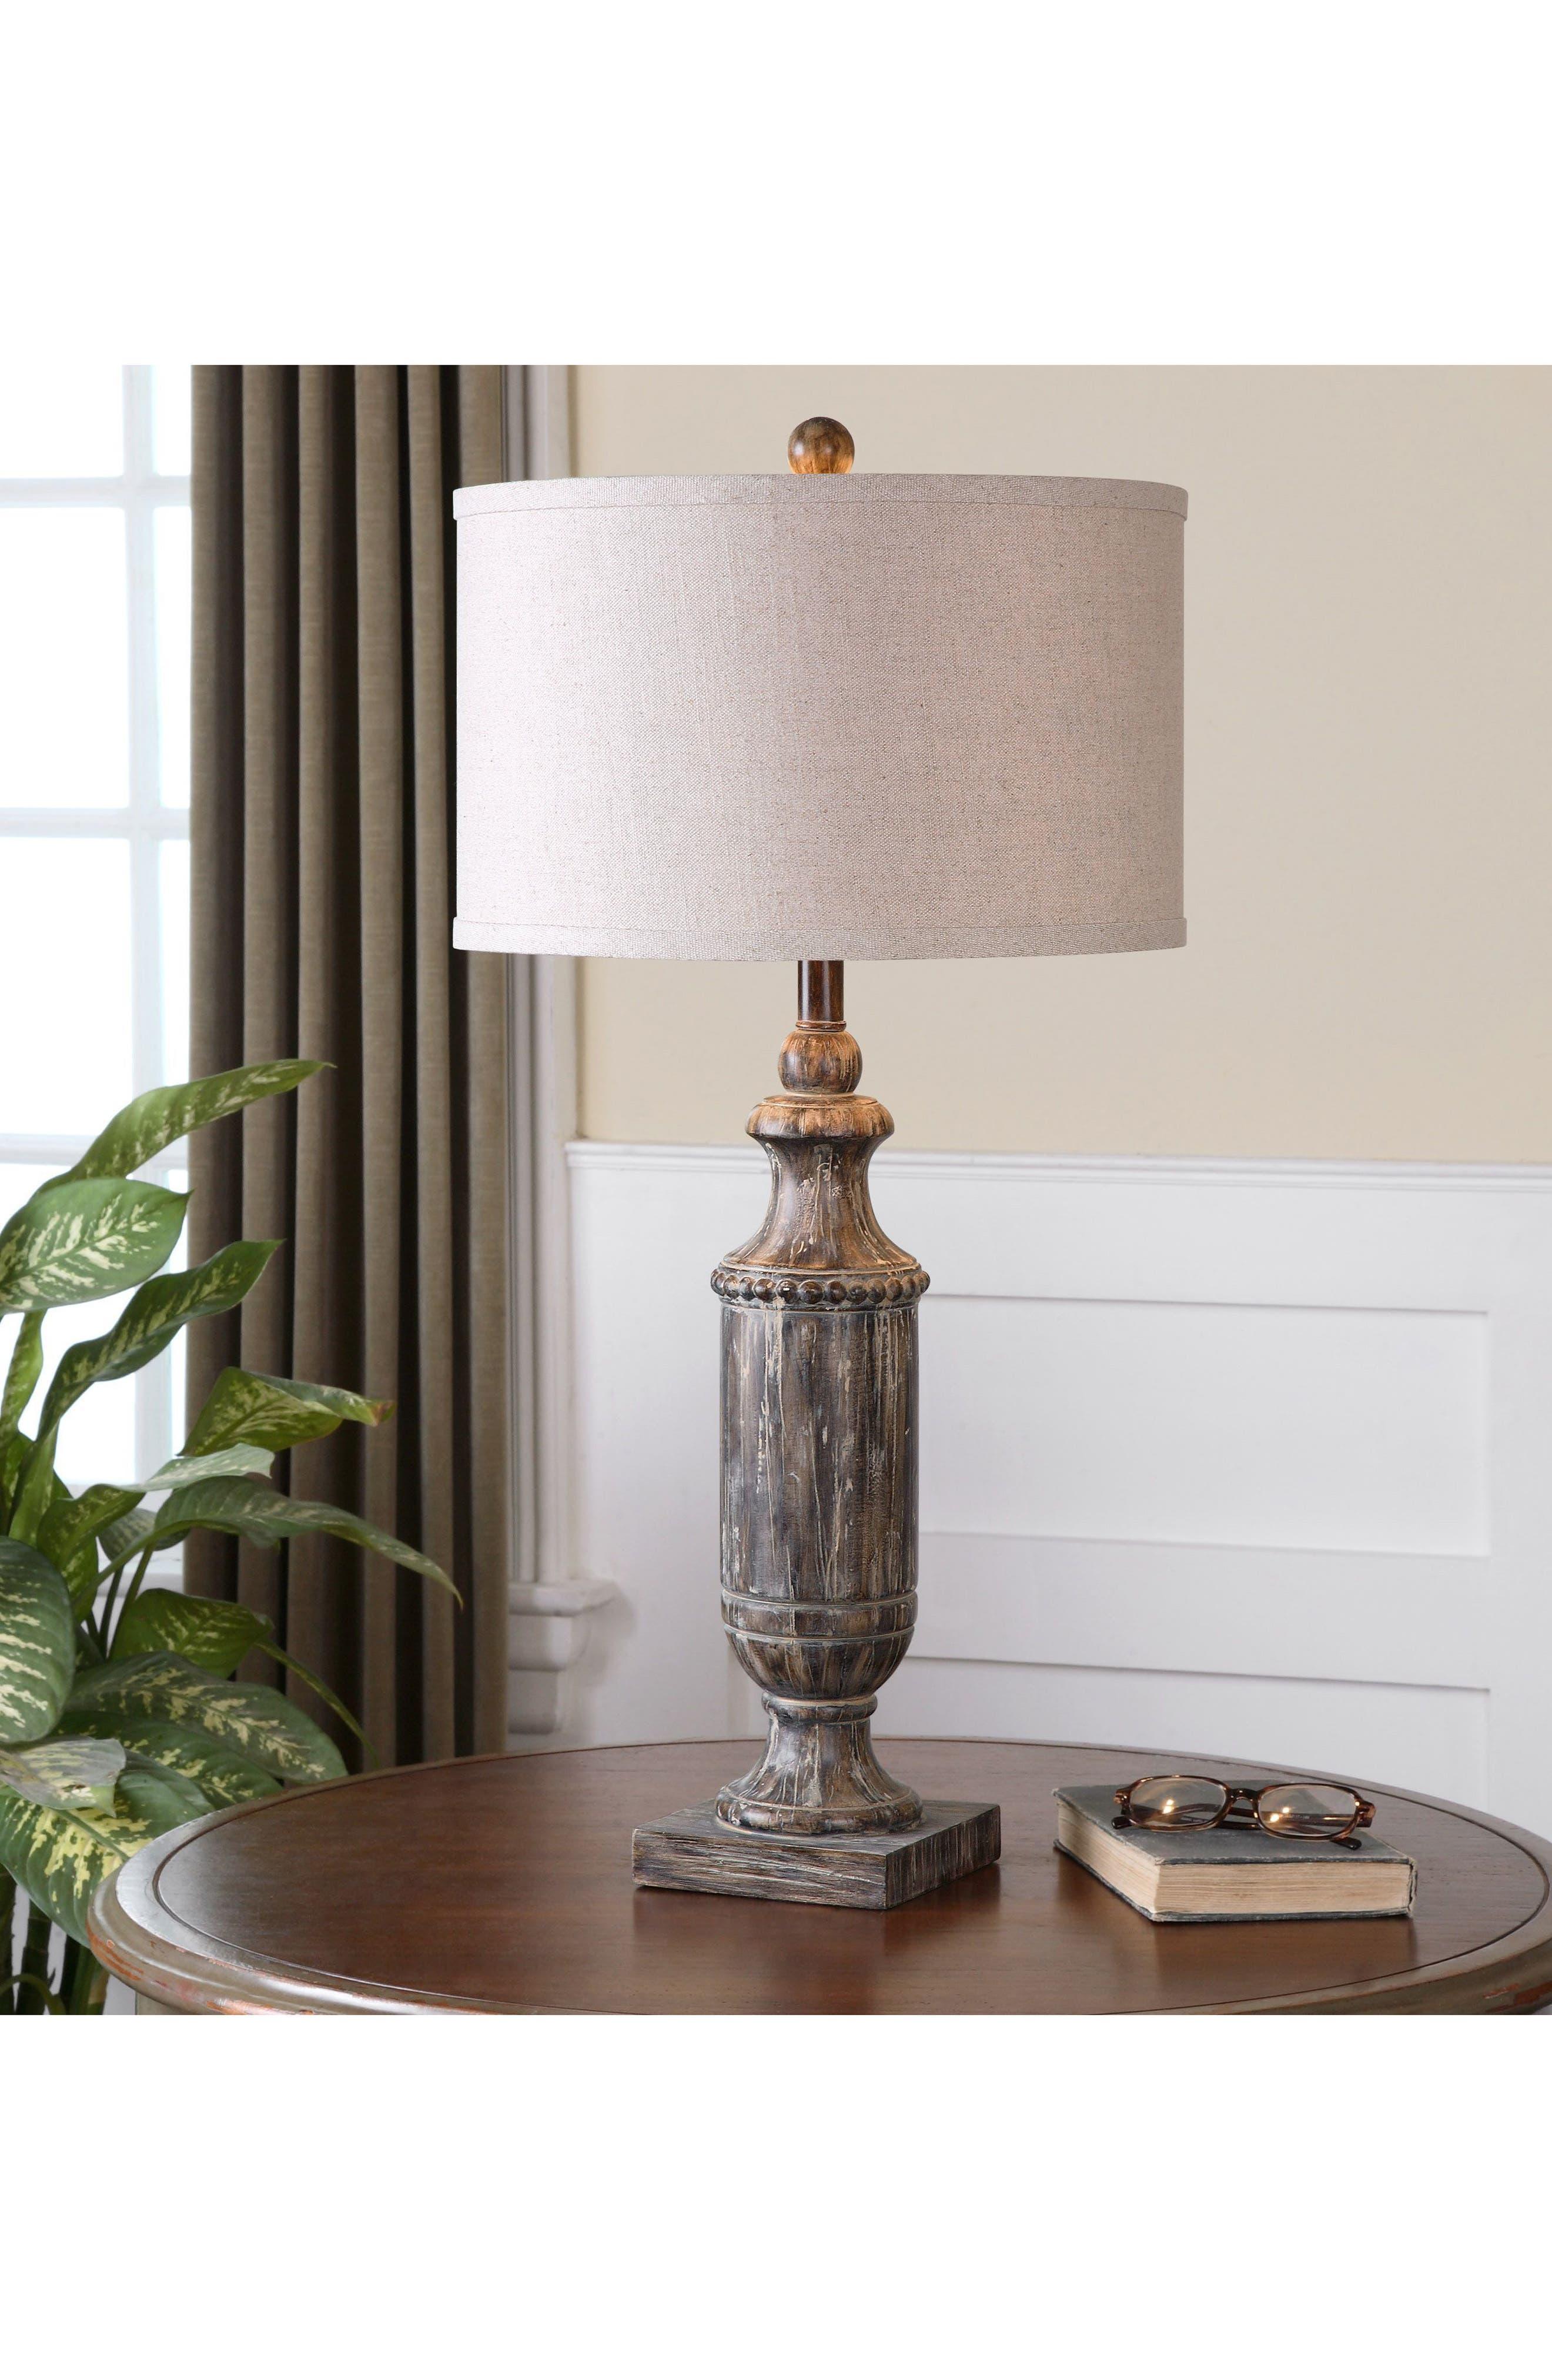 Agliano Table Lamp,                             Alternate thumbnail 2, color,                             710